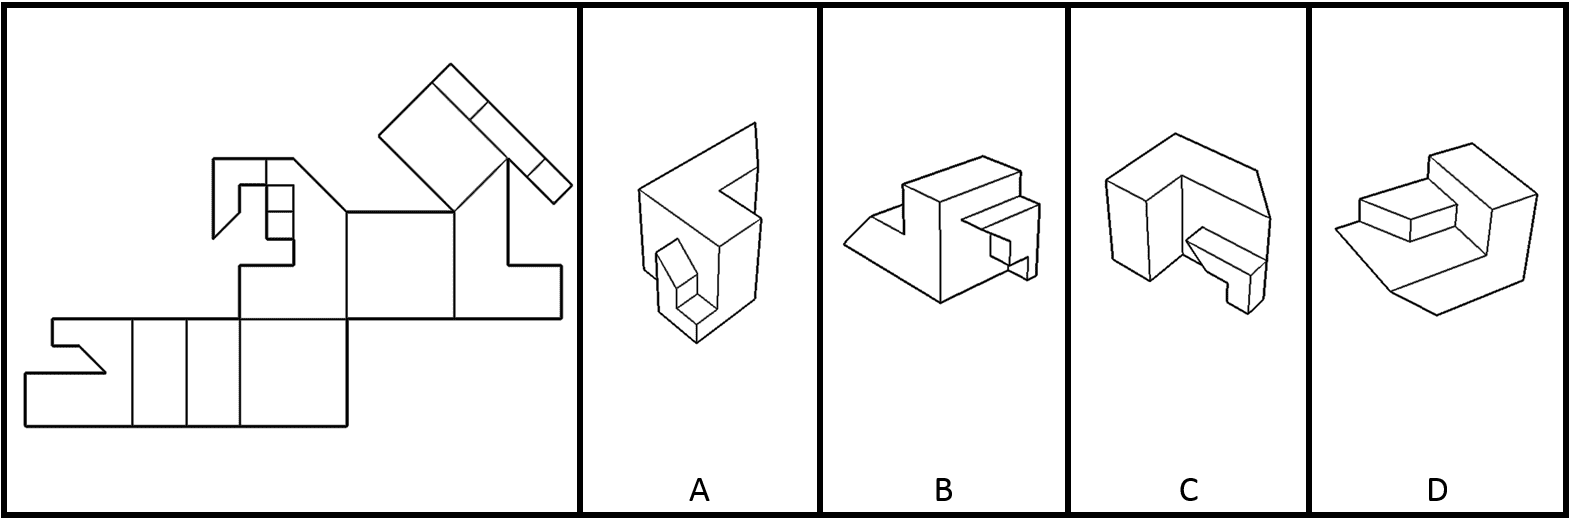 Pattern Folding5_post